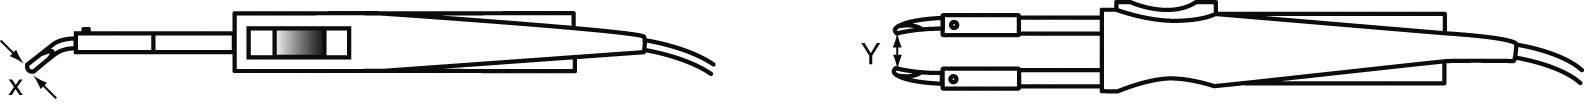 Spájkovací hrot plochá forma Weller Professional WTA-5, velikost hrotu 18.5 mm, 1 ks